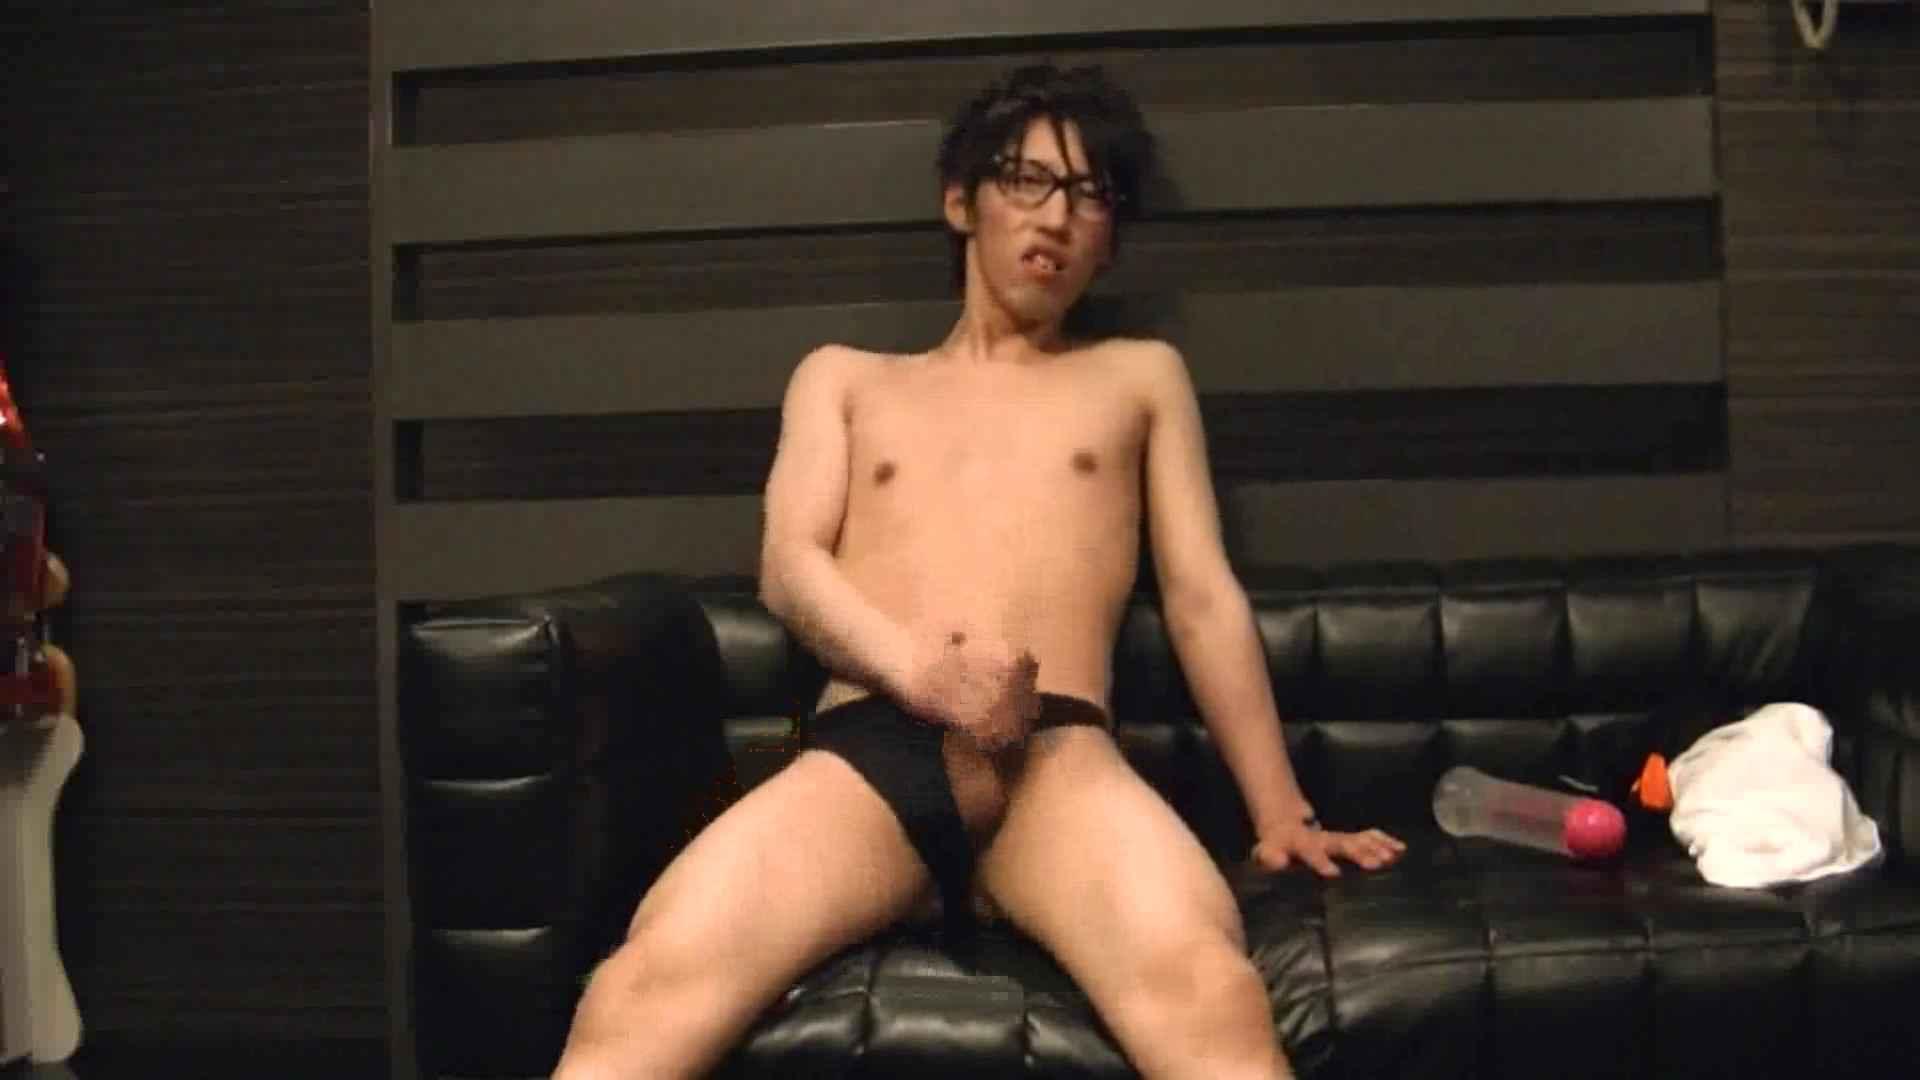 ONA見せカーニバル!! Vol3 男 ゲイ無料無修正画像 89枚 8